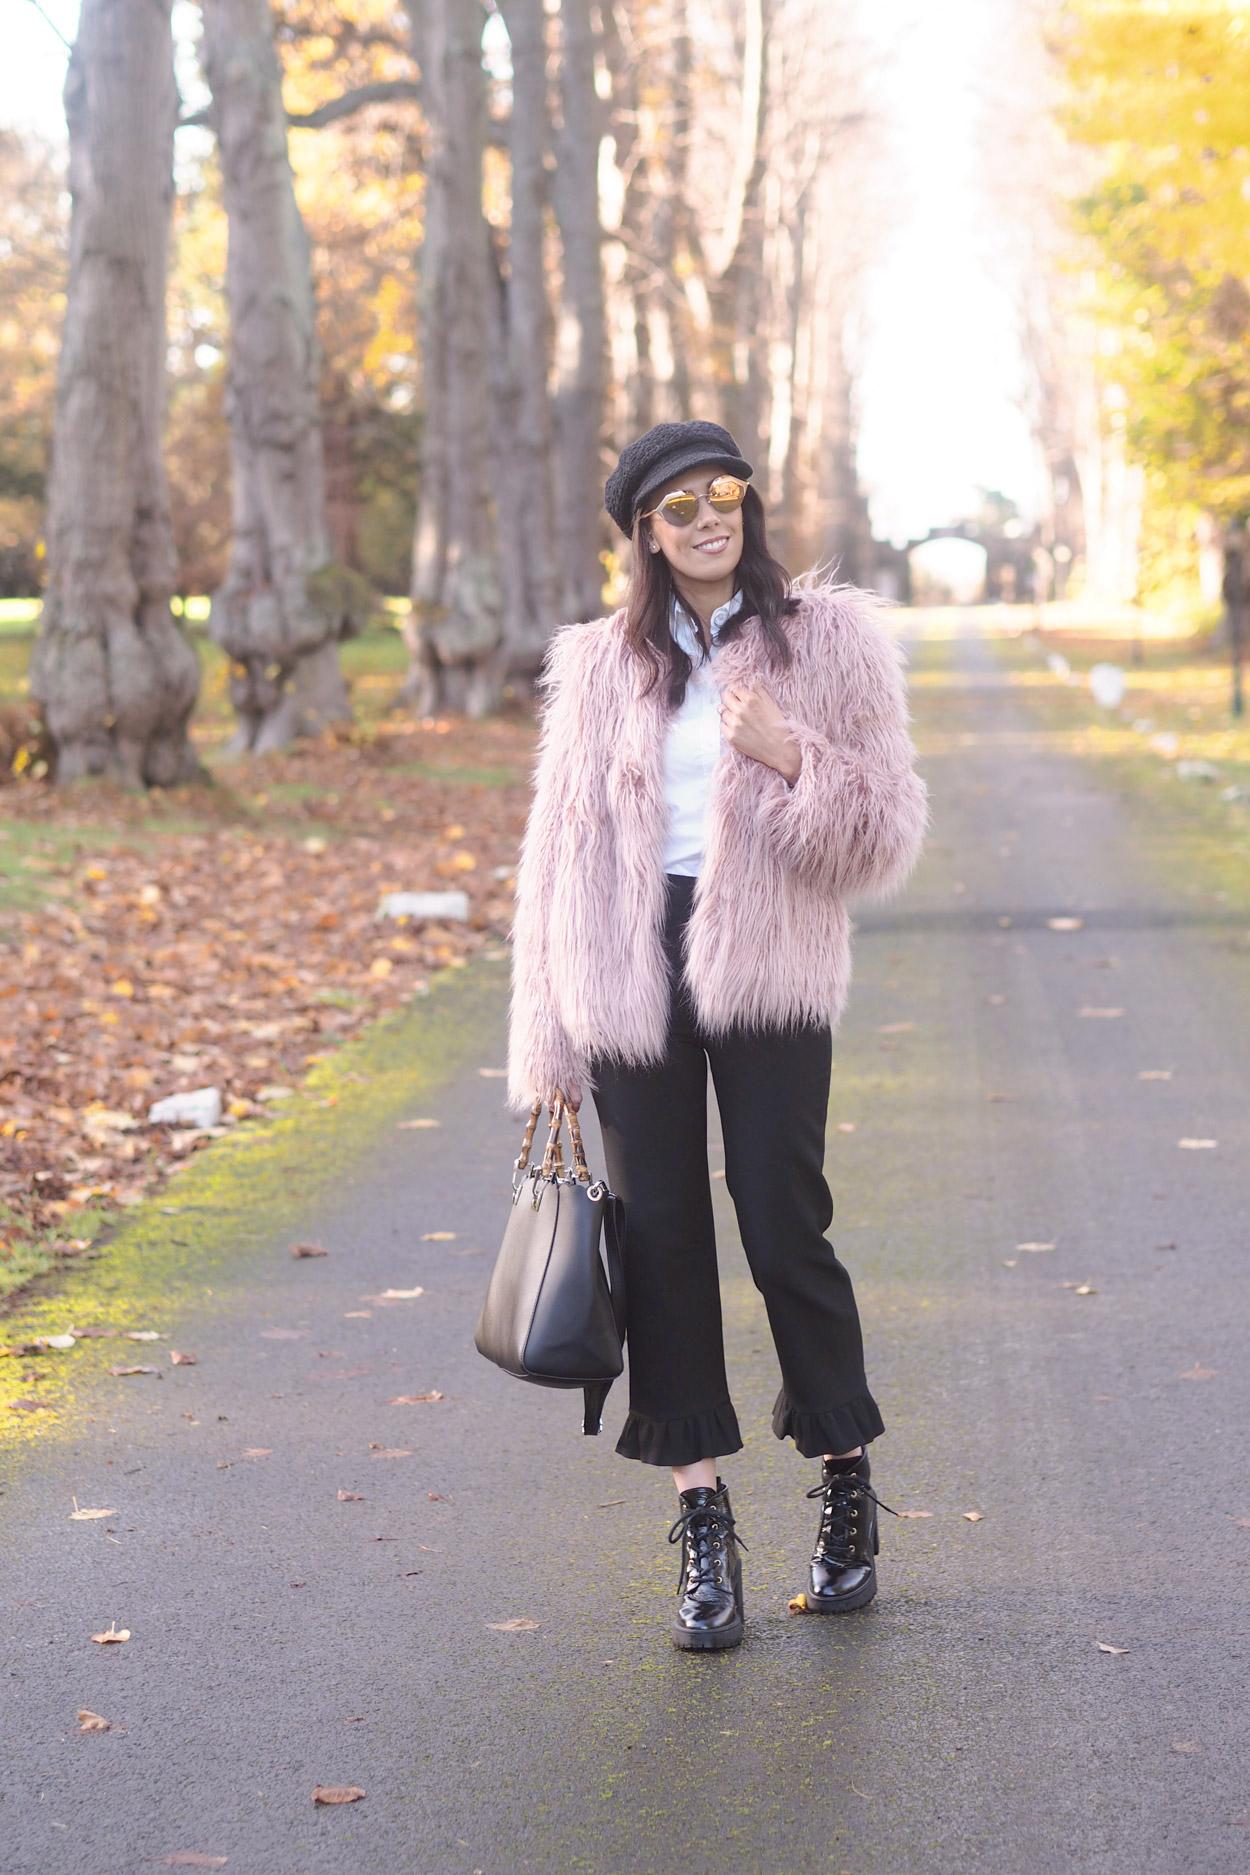 pink shaggy fur jacket | winter style | winter lookbook | Bulgari Serpenti pink mirror sunglasses | autumn fashion | fall style | lookbook